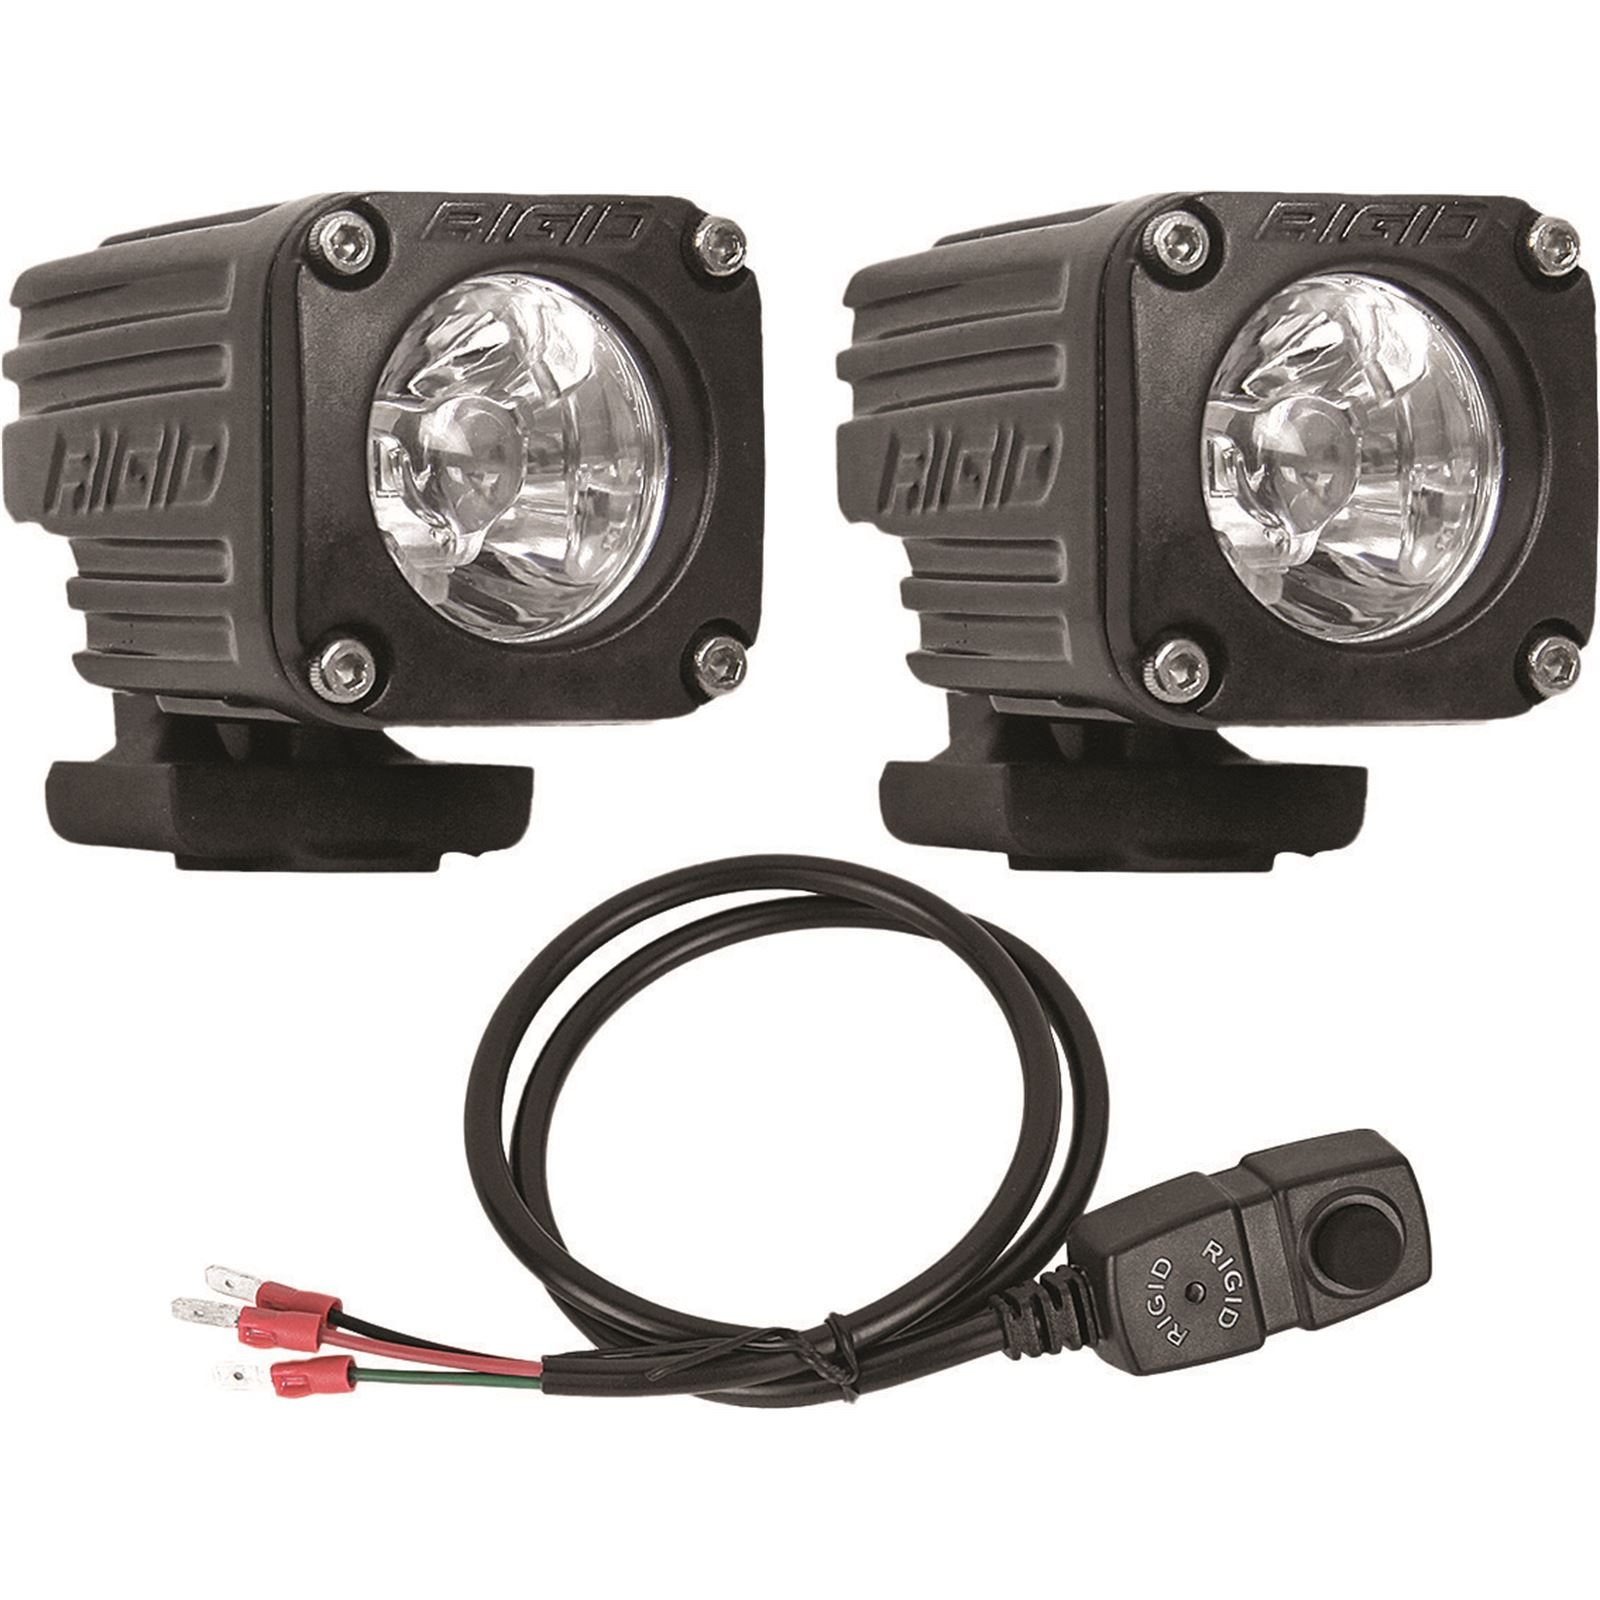 Rigid Ignite Series Light Kit w/Hi/Low Option